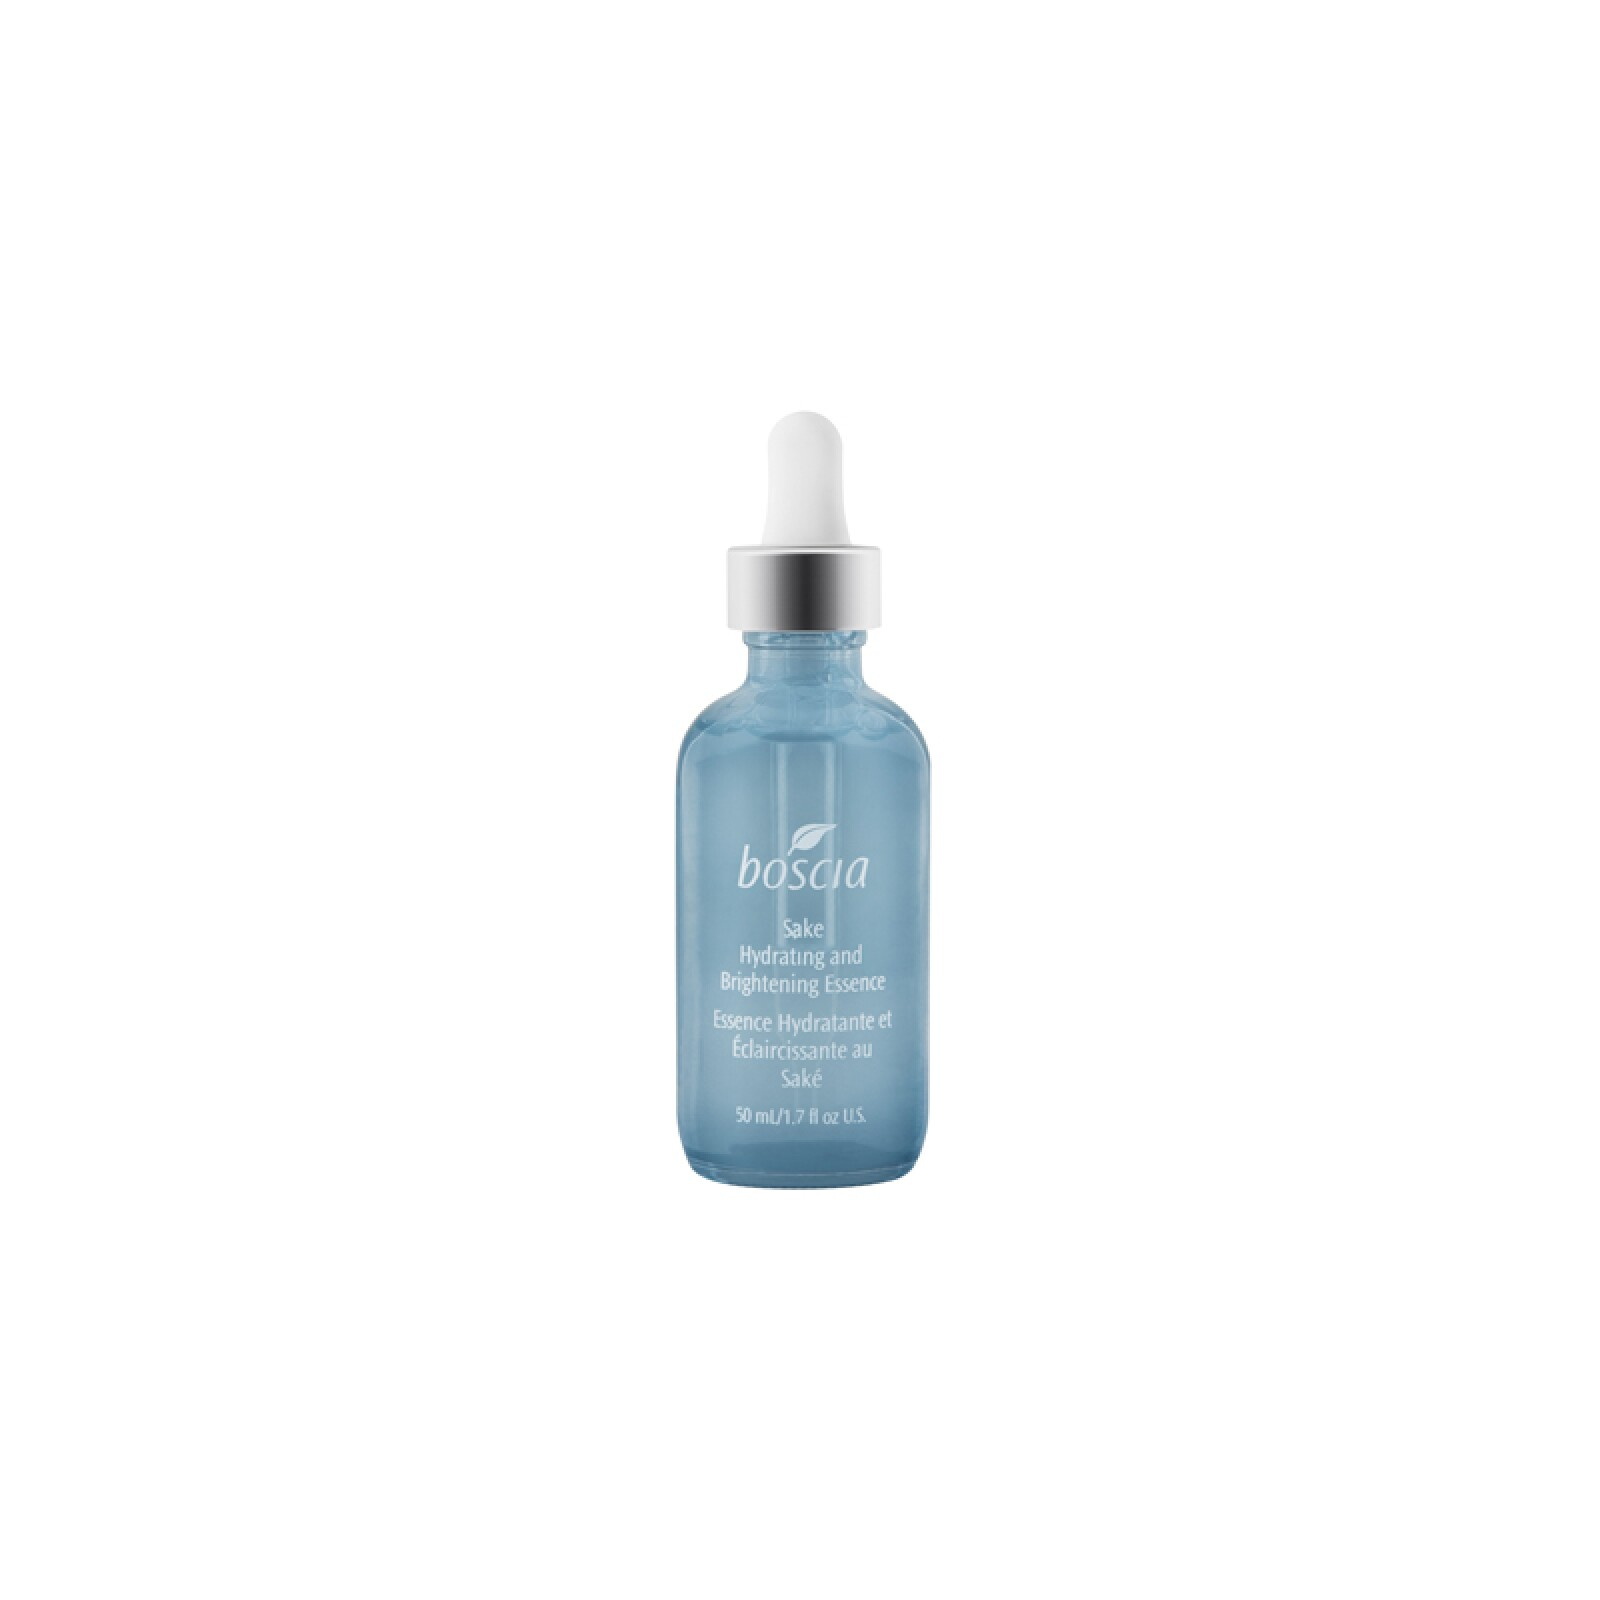 productos-maquillaje-skincare-belleza-beauty-rutina-boscia